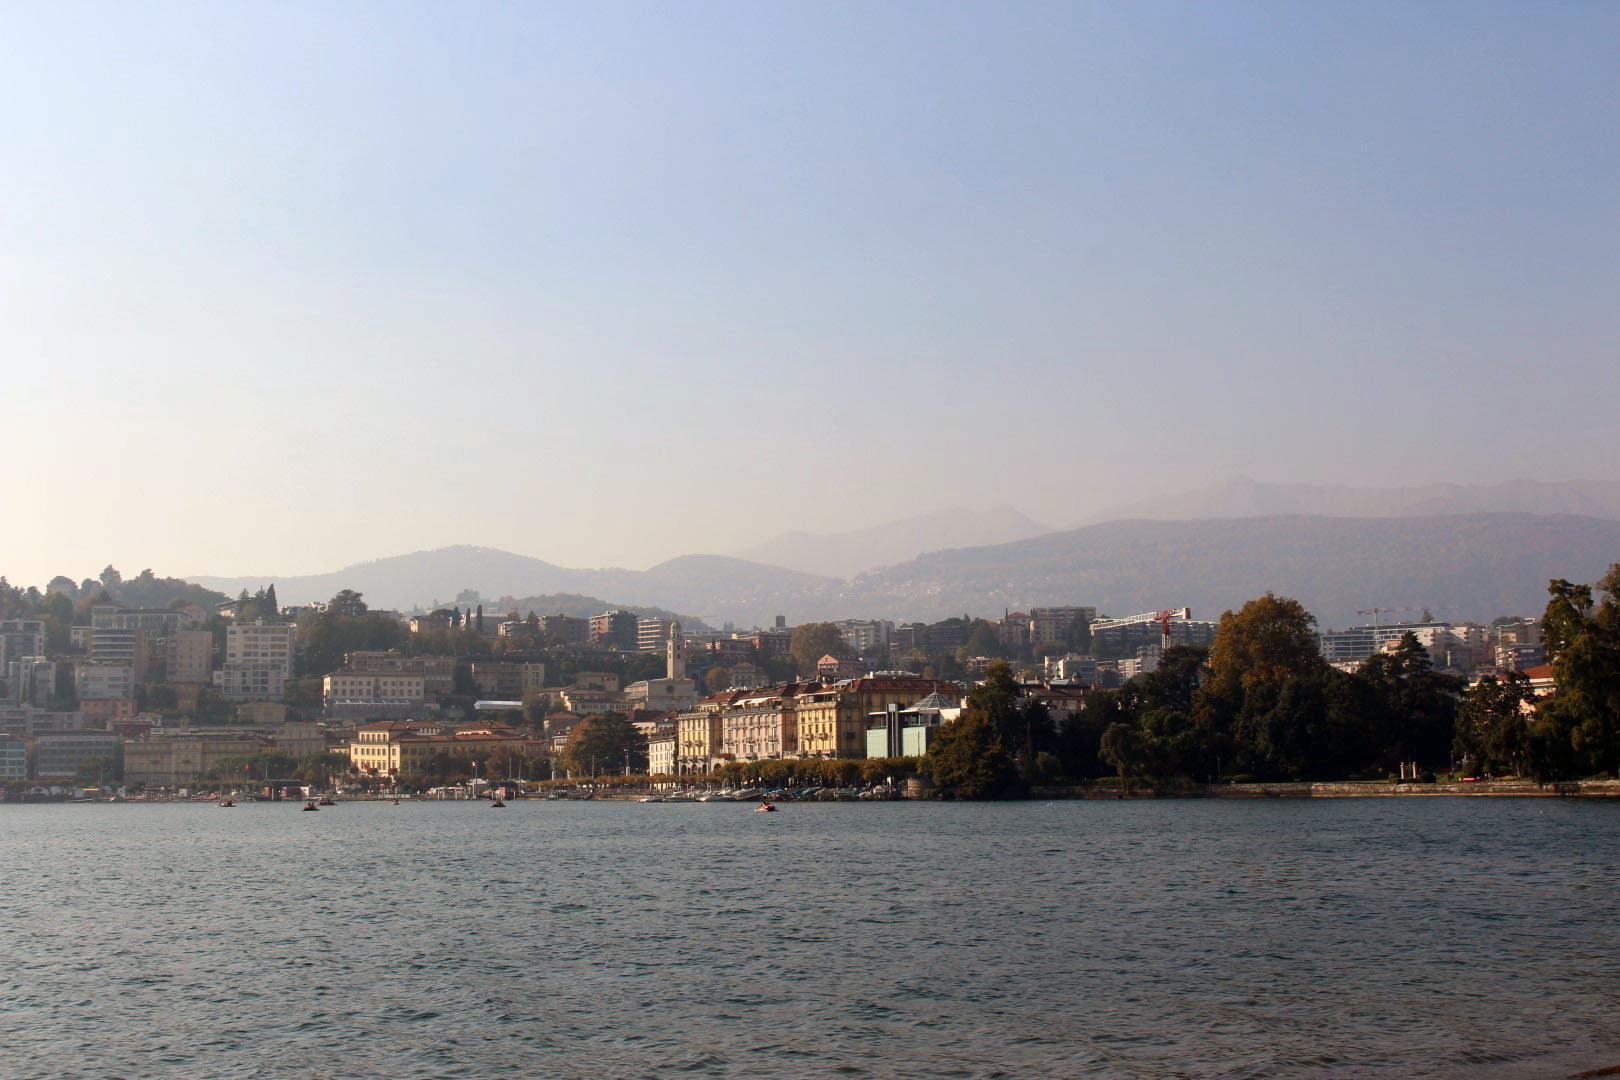 Svajcarska_Lugano_Evropske_metropole_Izlet_Jezero_Metropole_First_minute_akcija